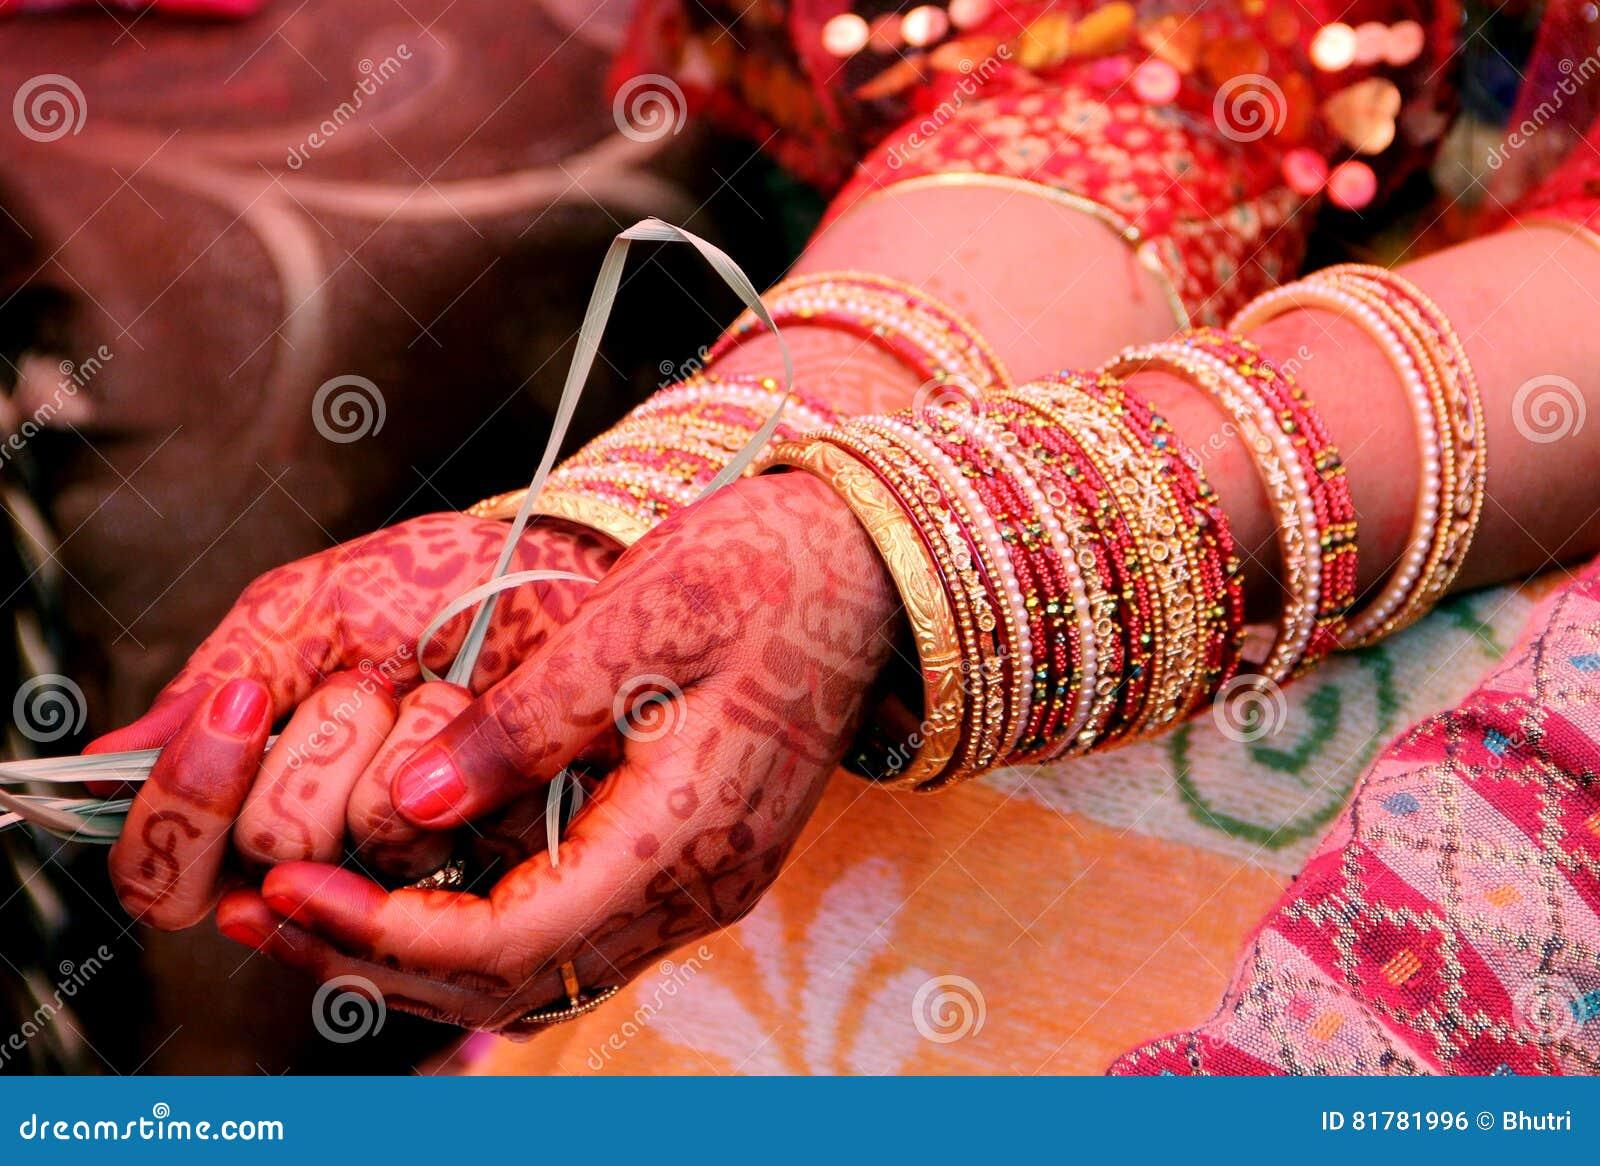 Mehndi Ceremony S Download : Nepali hindu wedding rituals stock photo image of groom hina